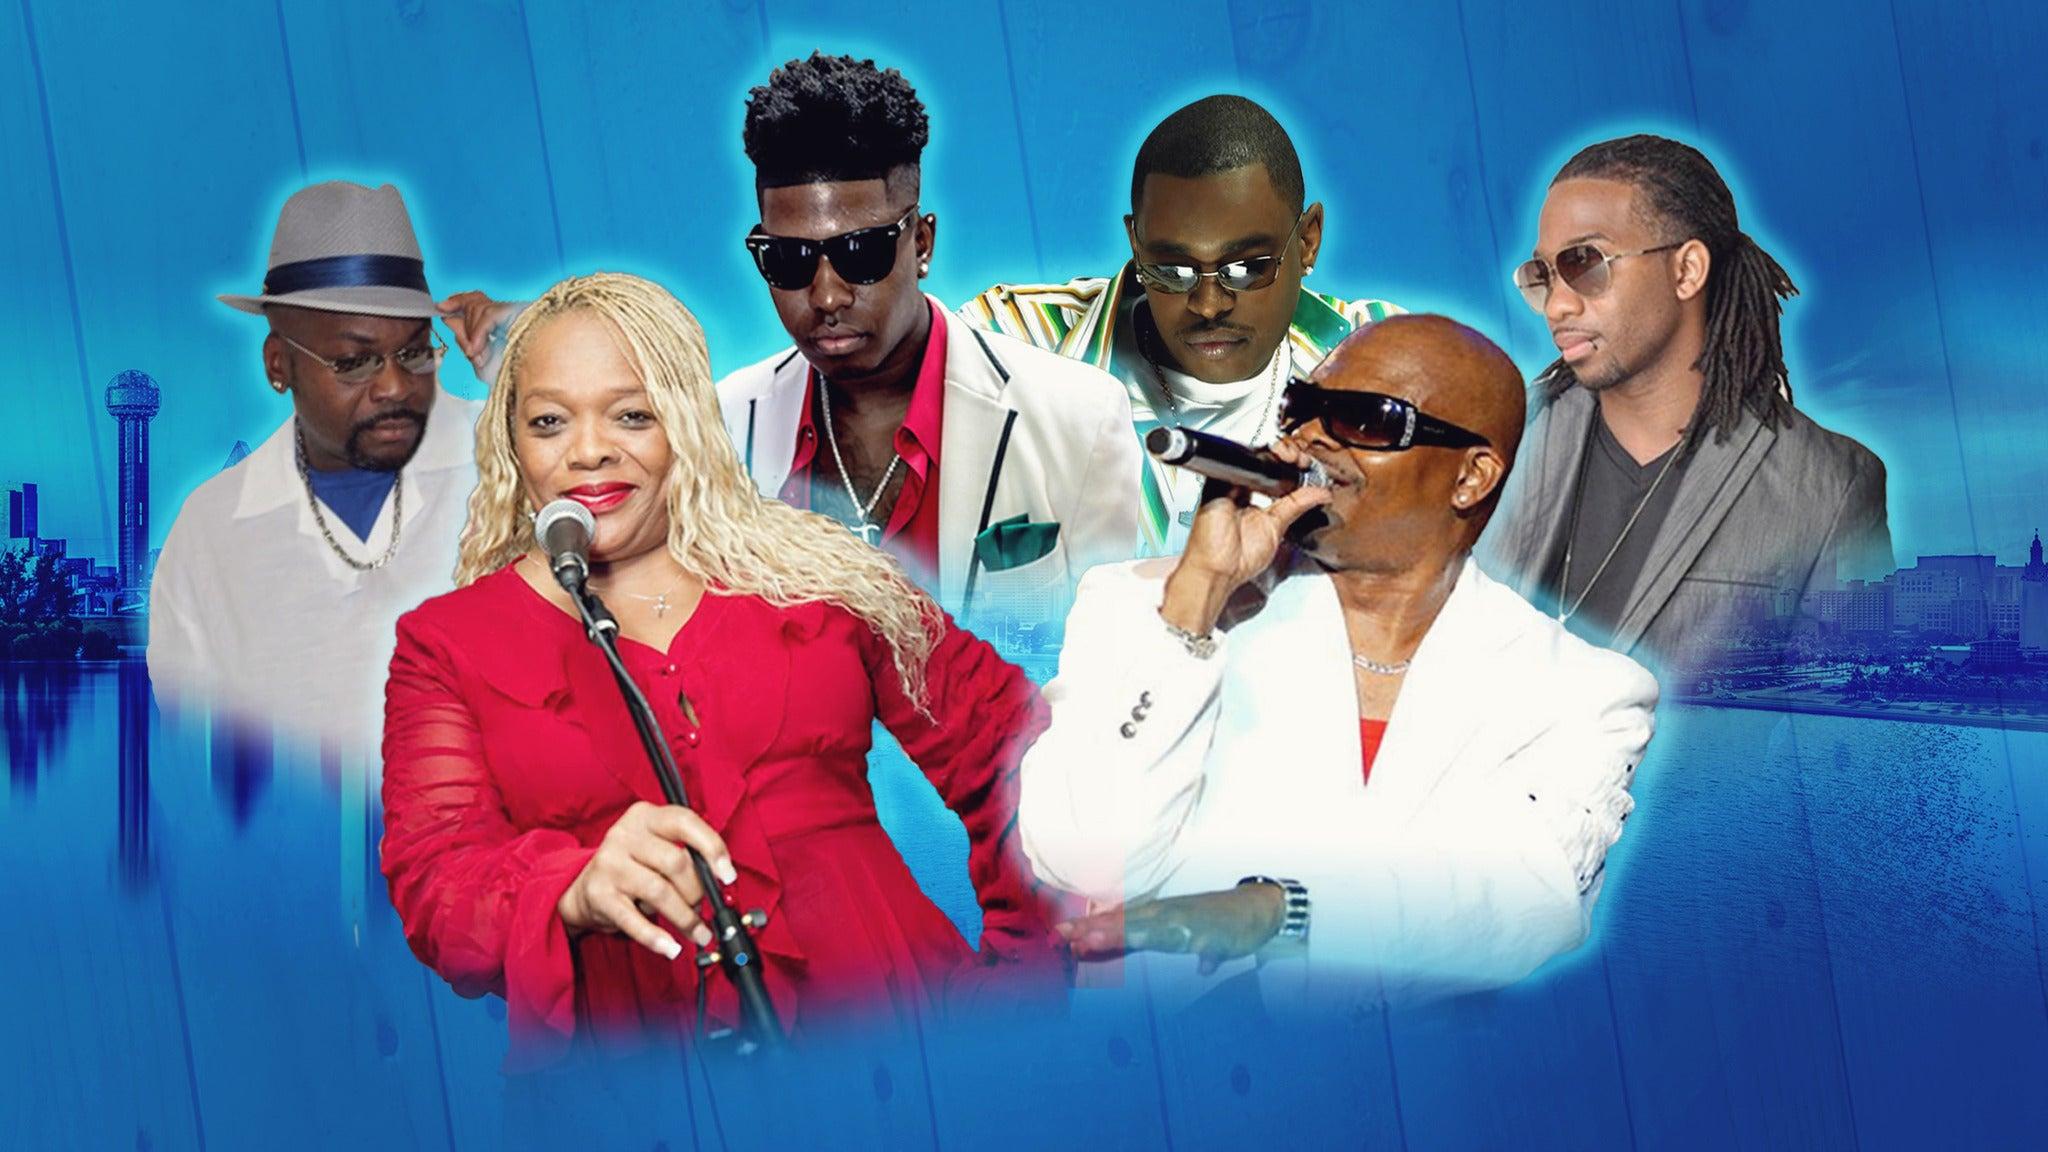 Atlanta Blues Festival at Cobb Energy Performing Arts Centre